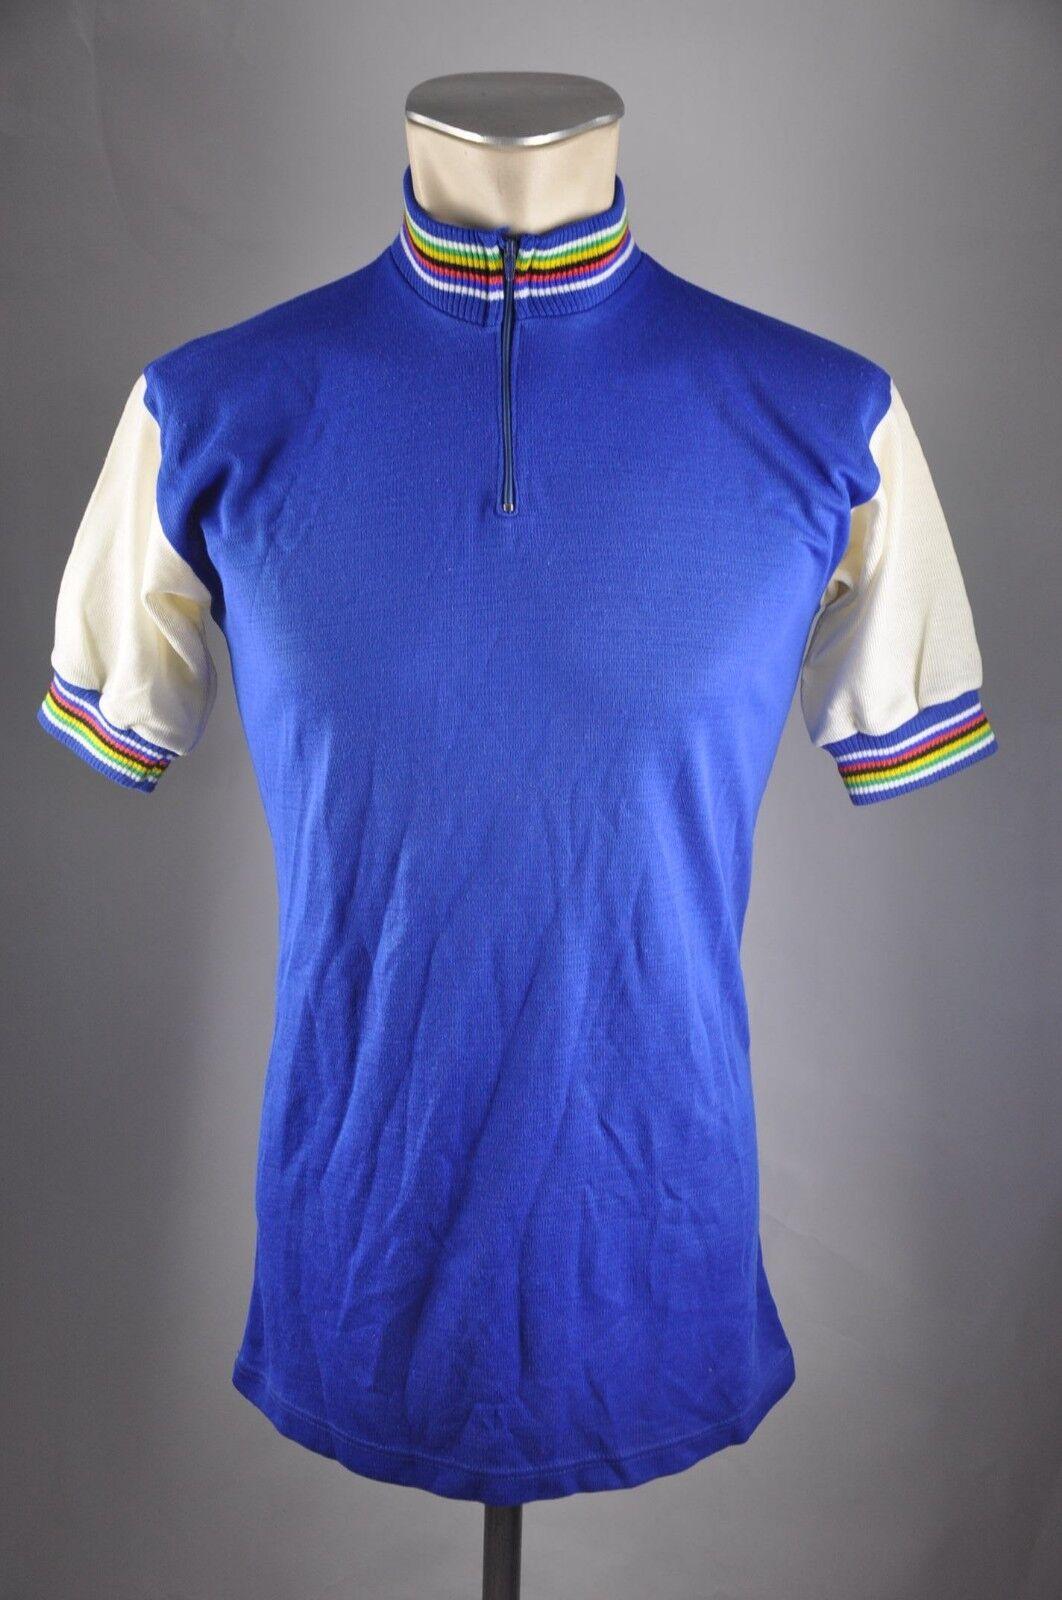 Vintage Akryl 80s Rad Trikot Gr. 5 50cm cykeltröja Shirt DA4